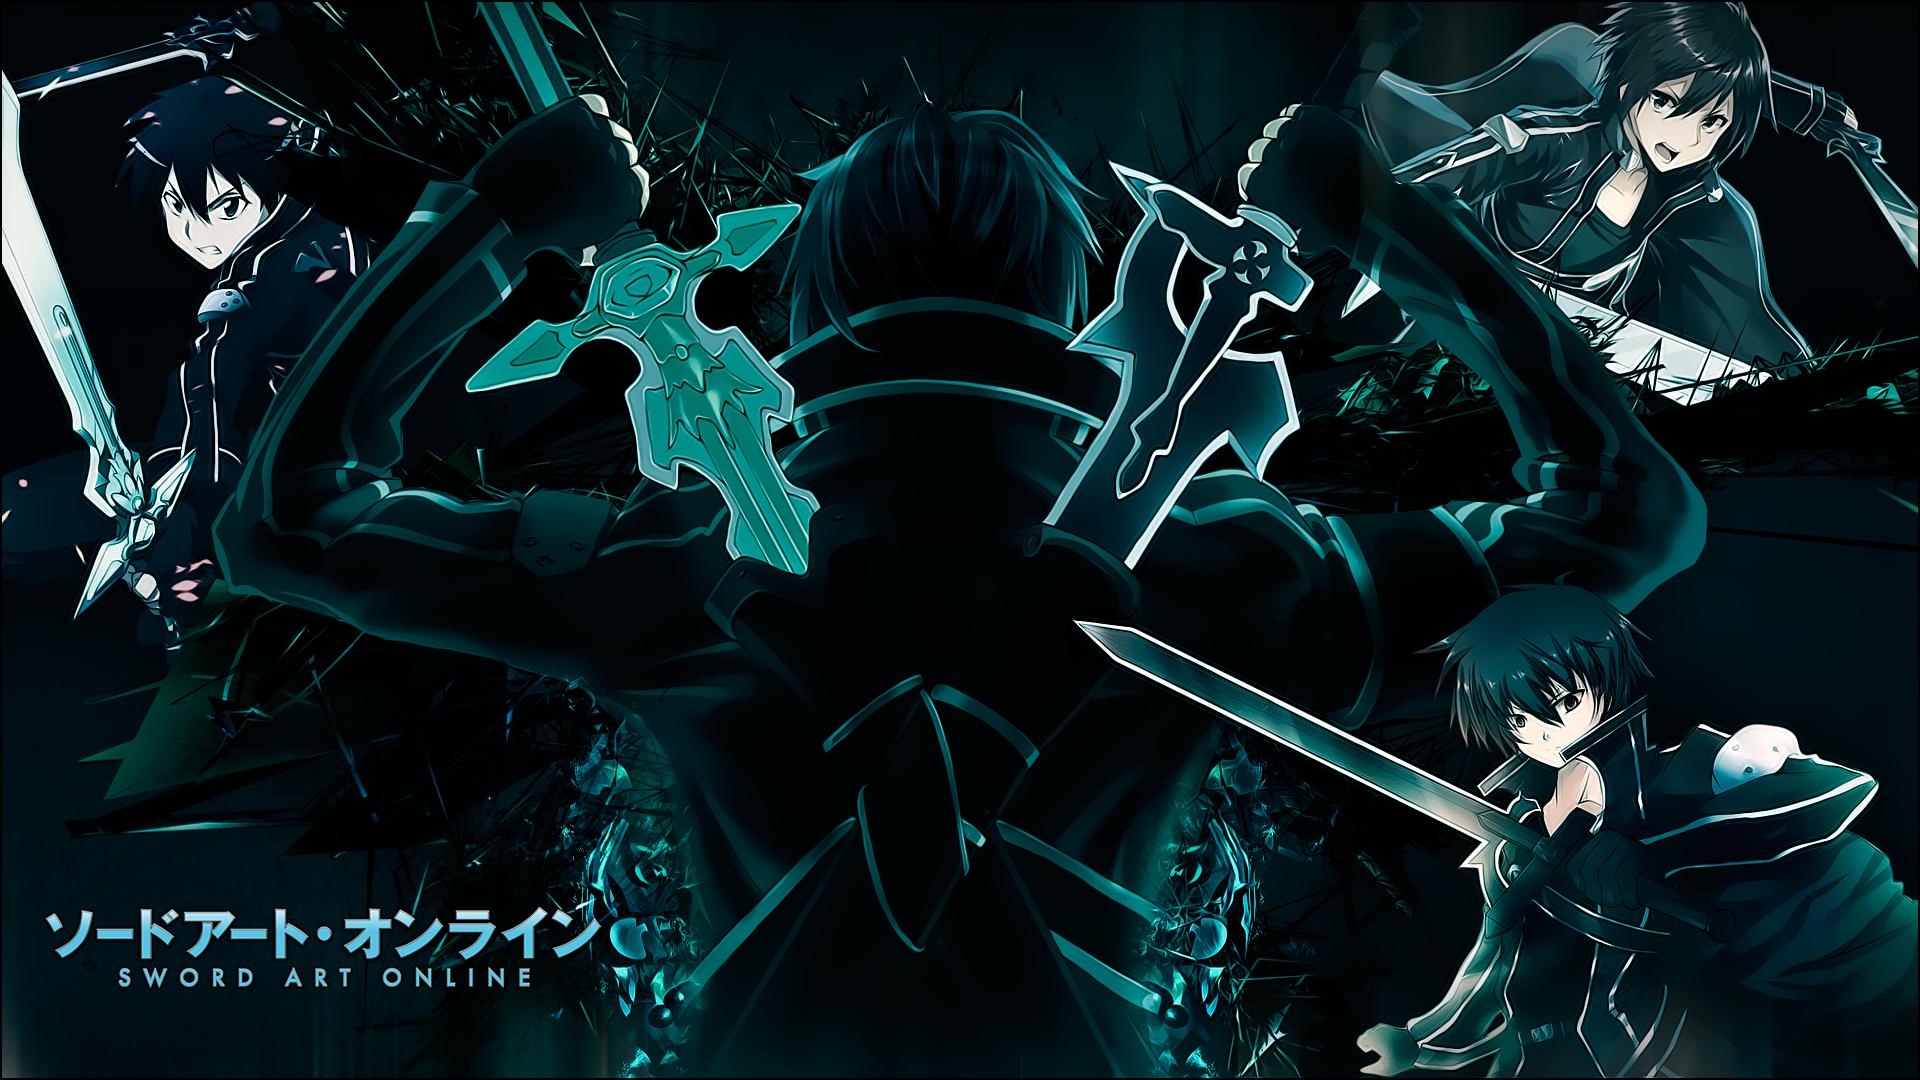 SAO Kirito Wallpaper HD - WallpaperSafari